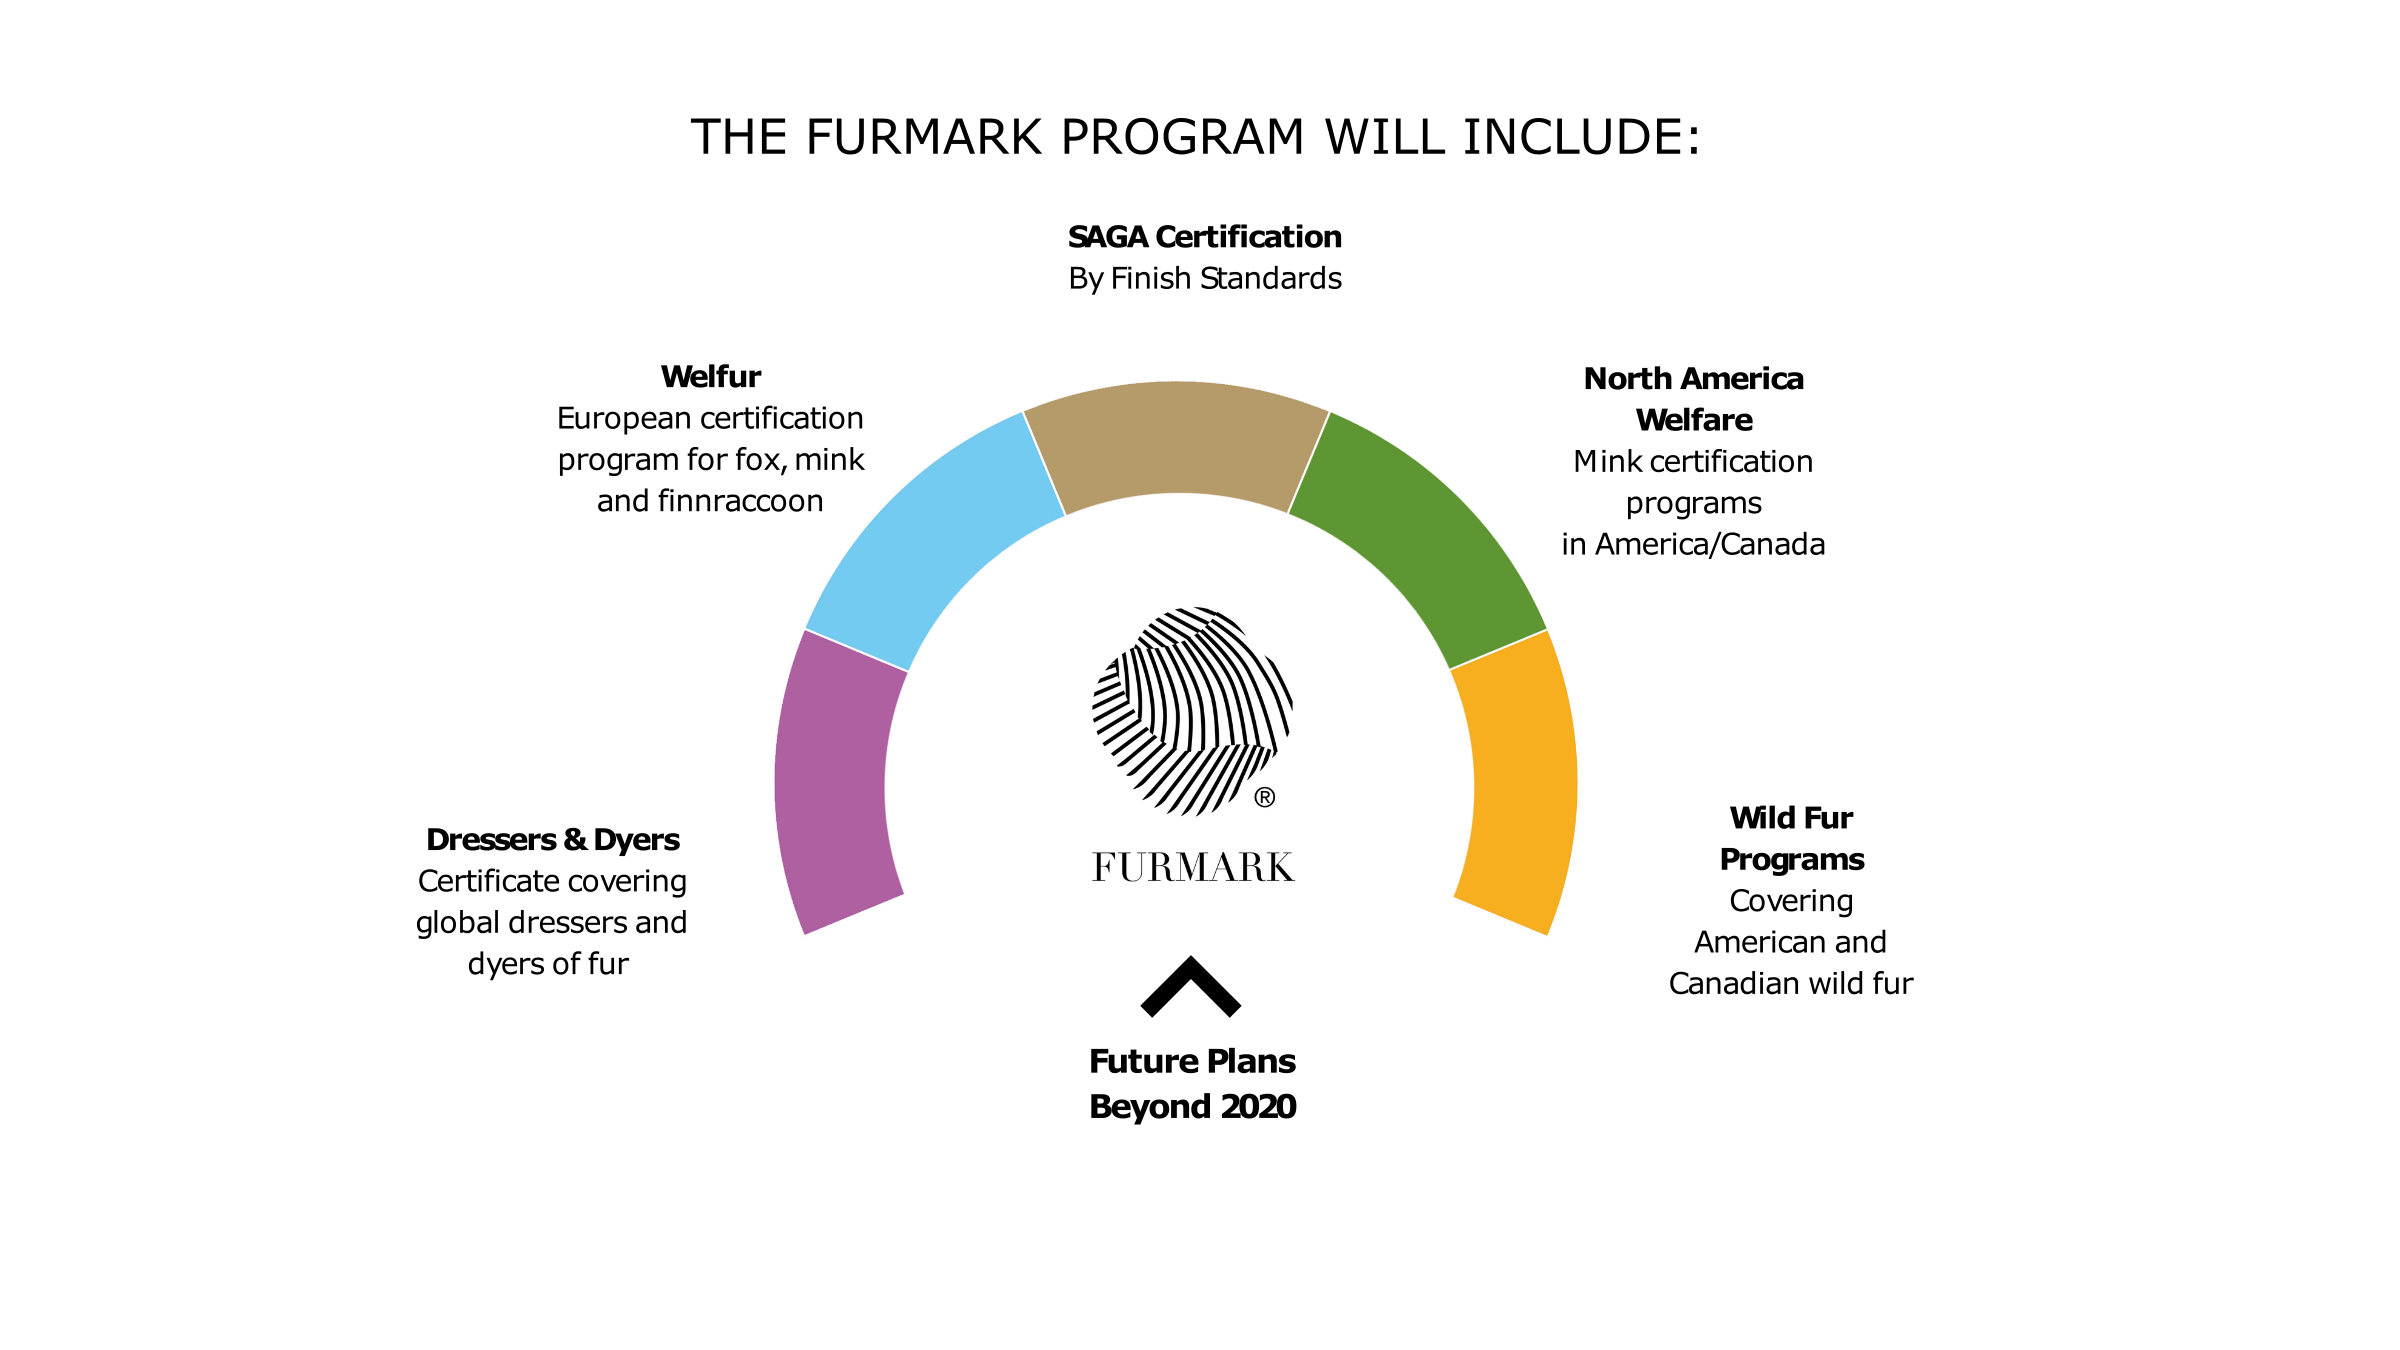 Furmark program